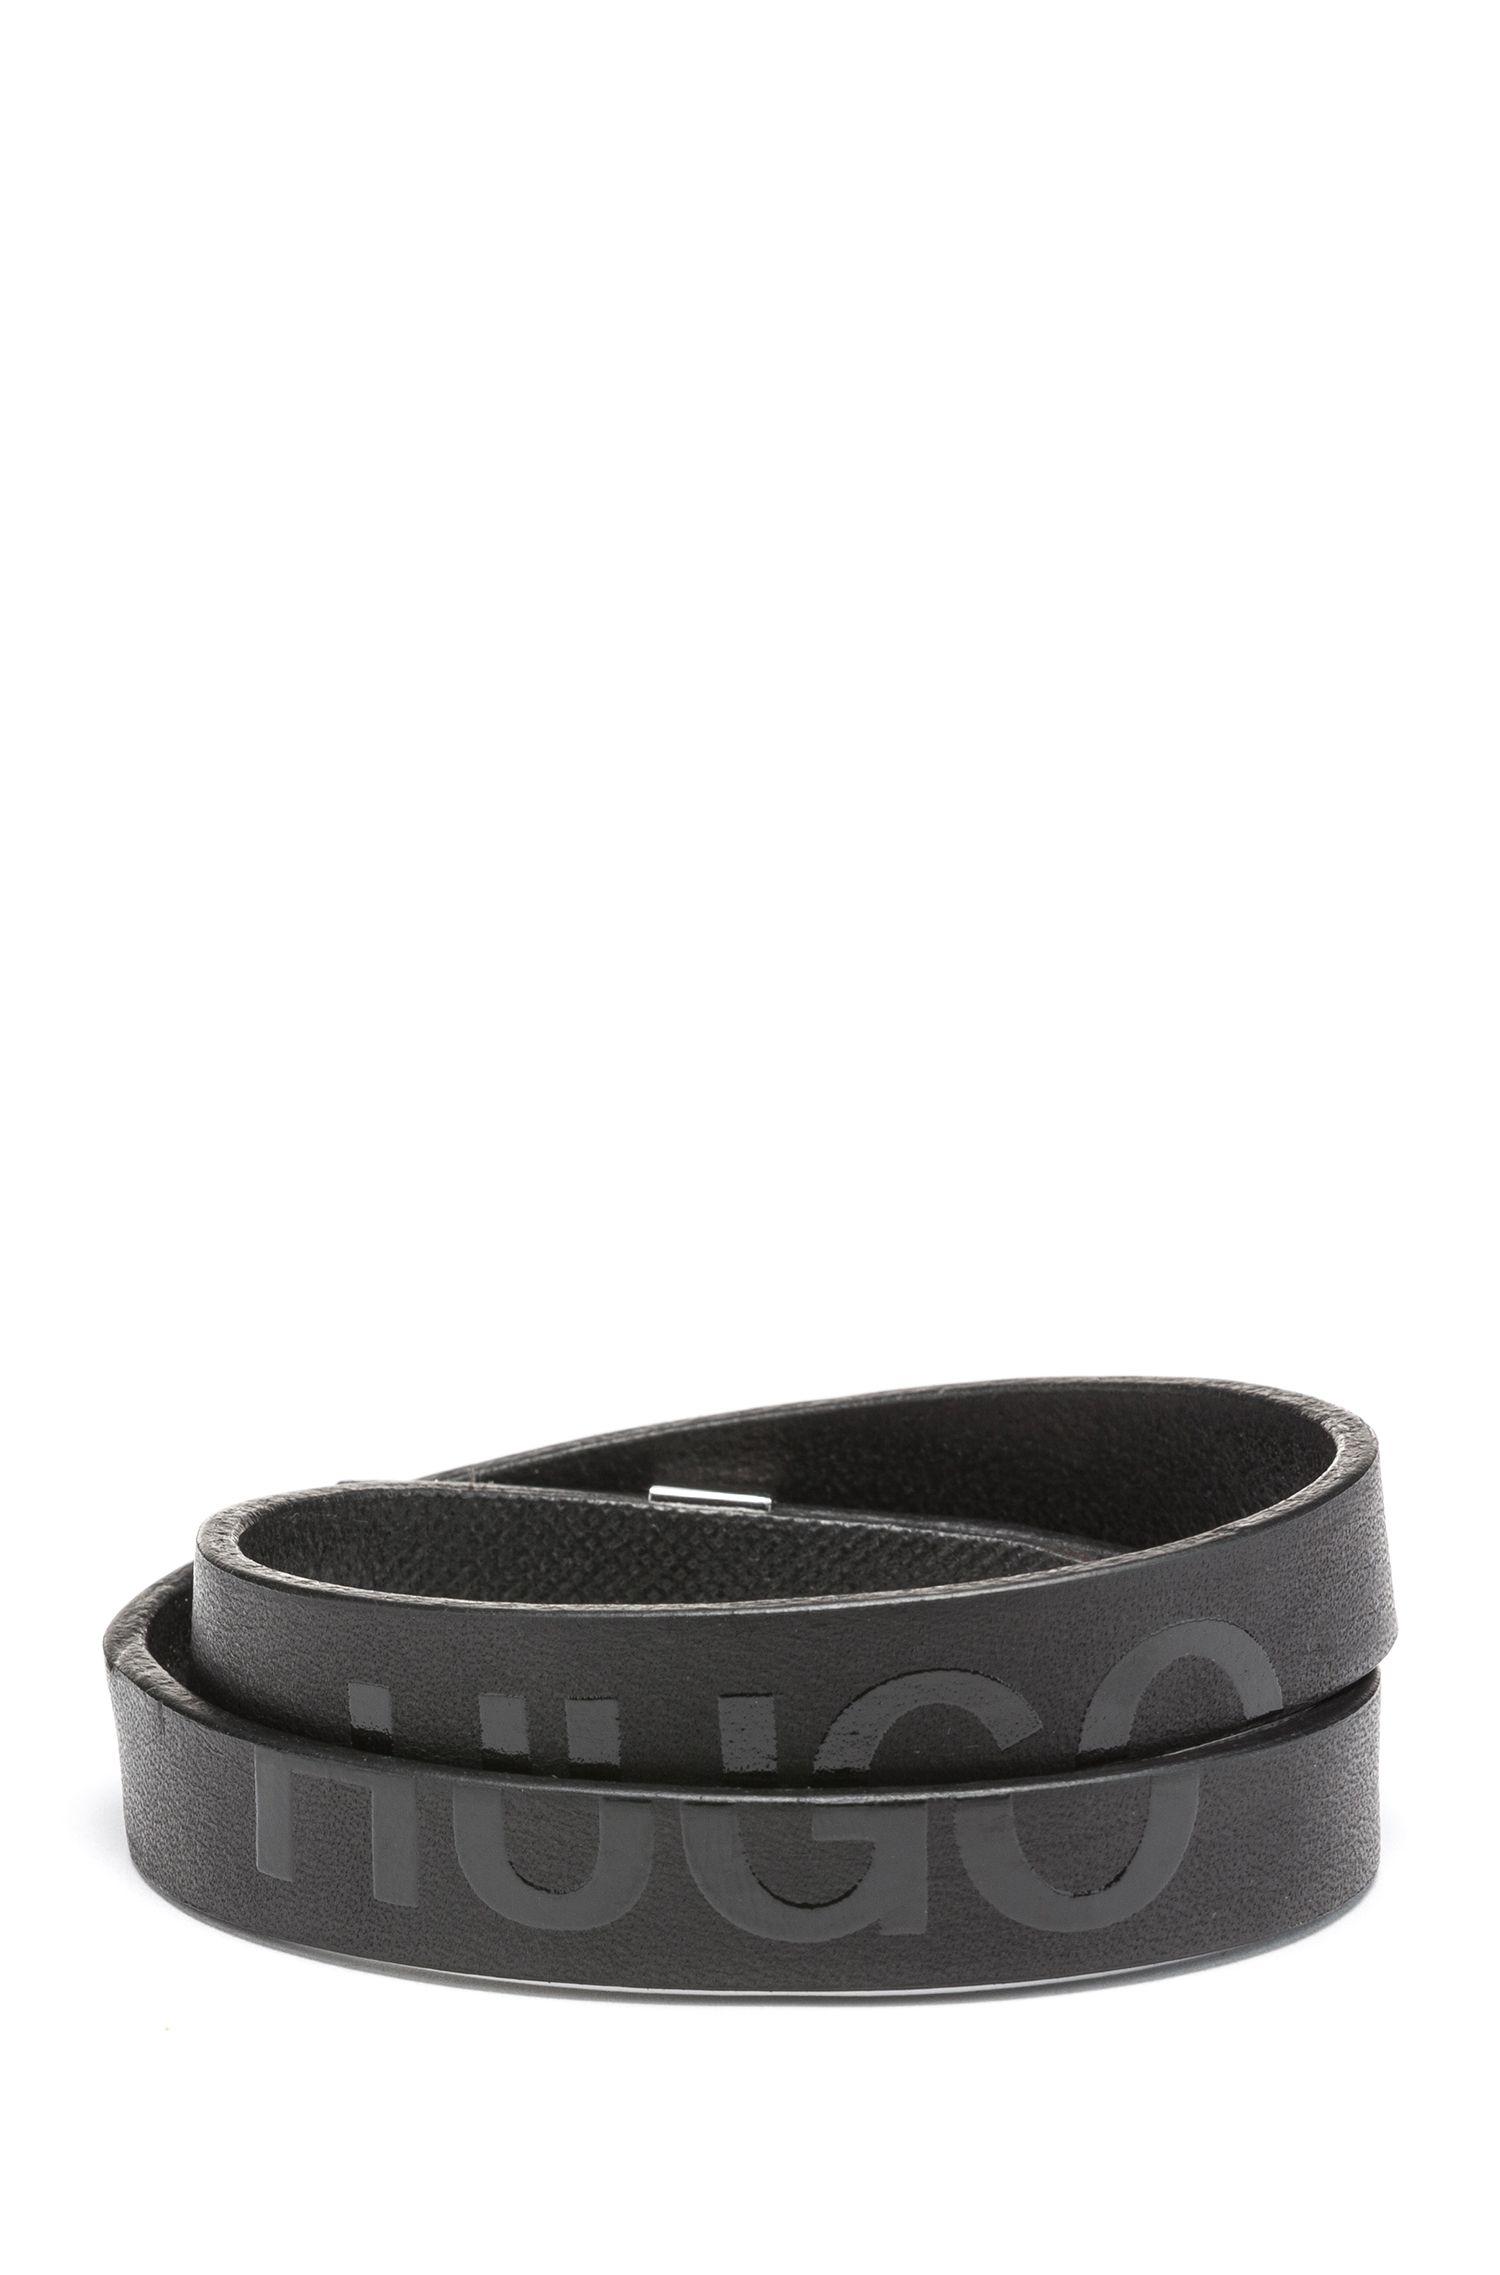 Hugo Boss - Double-wrap bracelet in Italian leather with cropped logo - 1